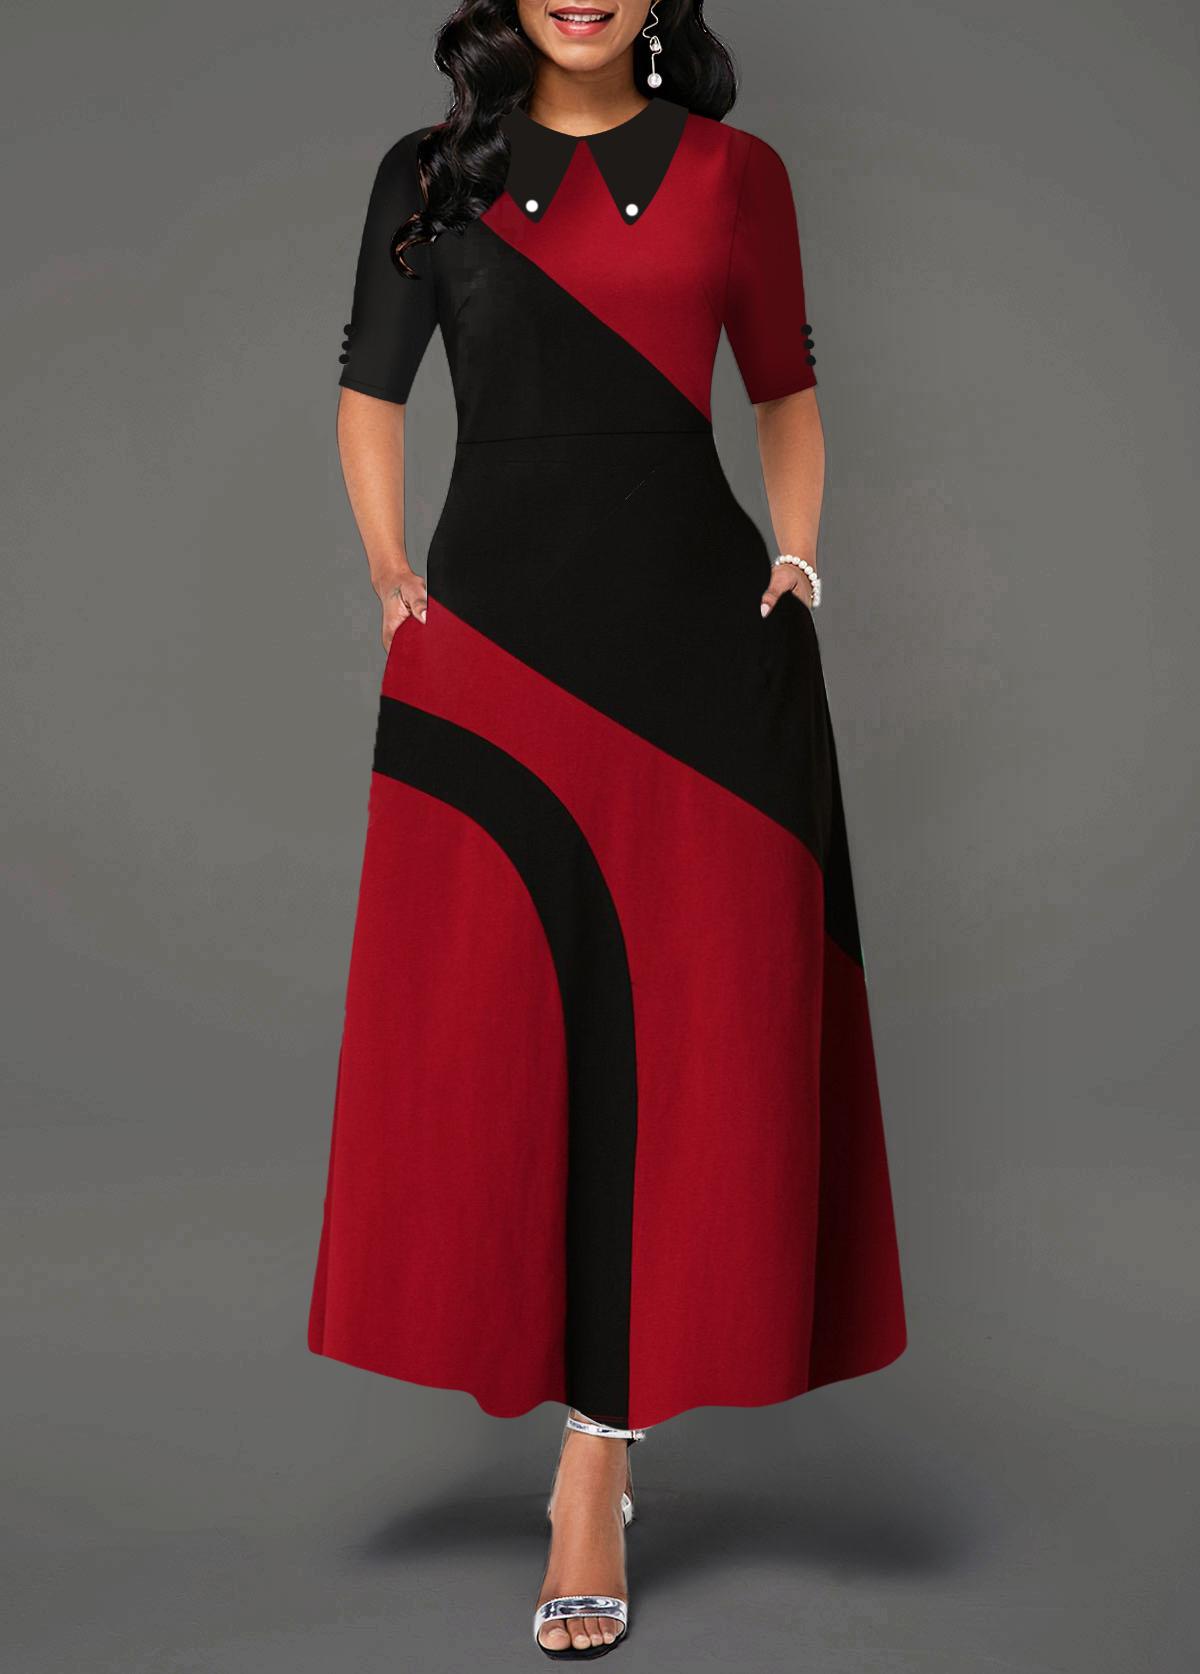 Contrast Turndown Collar Side Pocket Maxi Dress